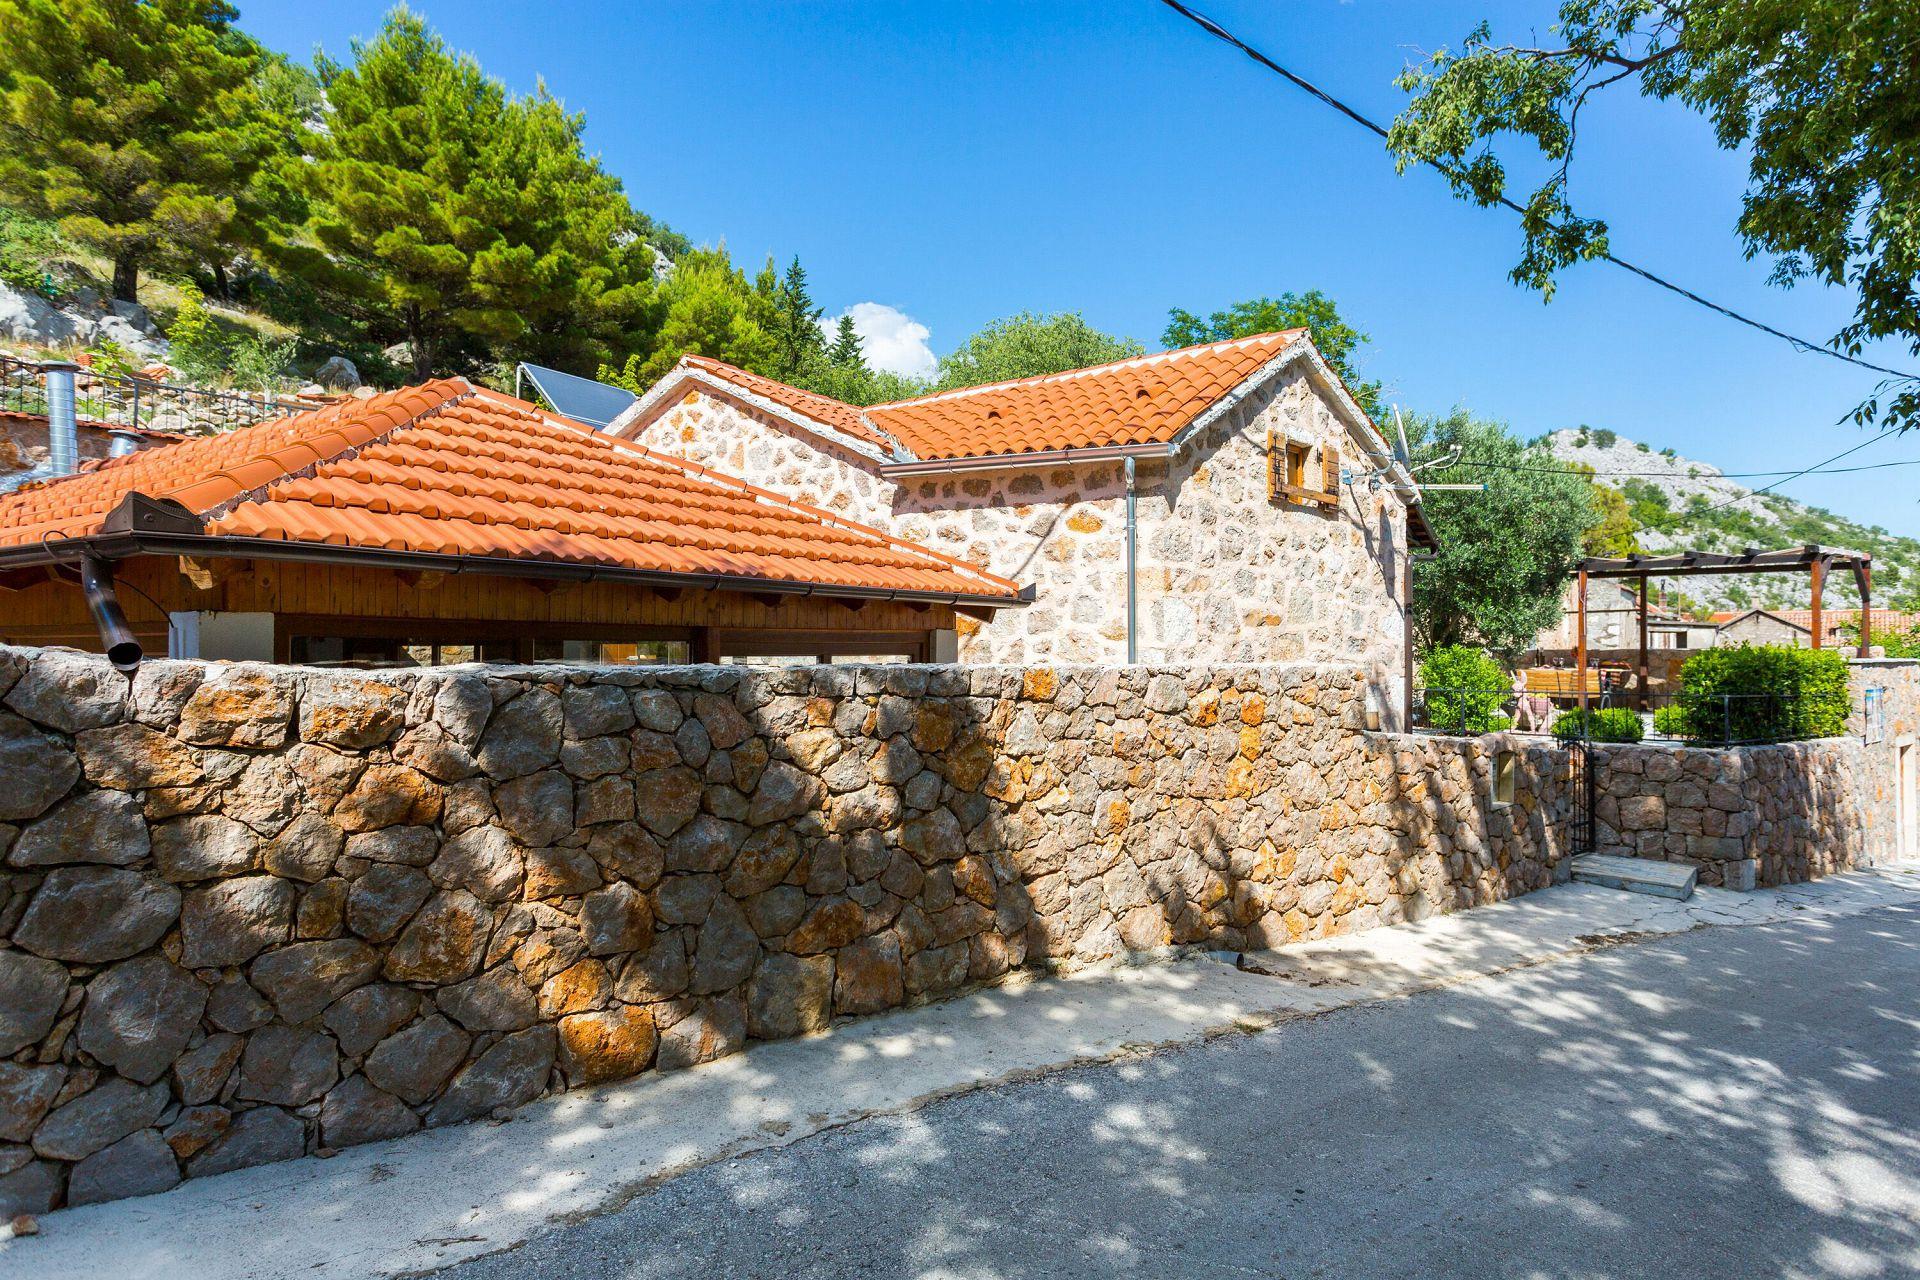 5697  - Starigrad-Paklenica - Ferienhäuser, Villen Kroatien